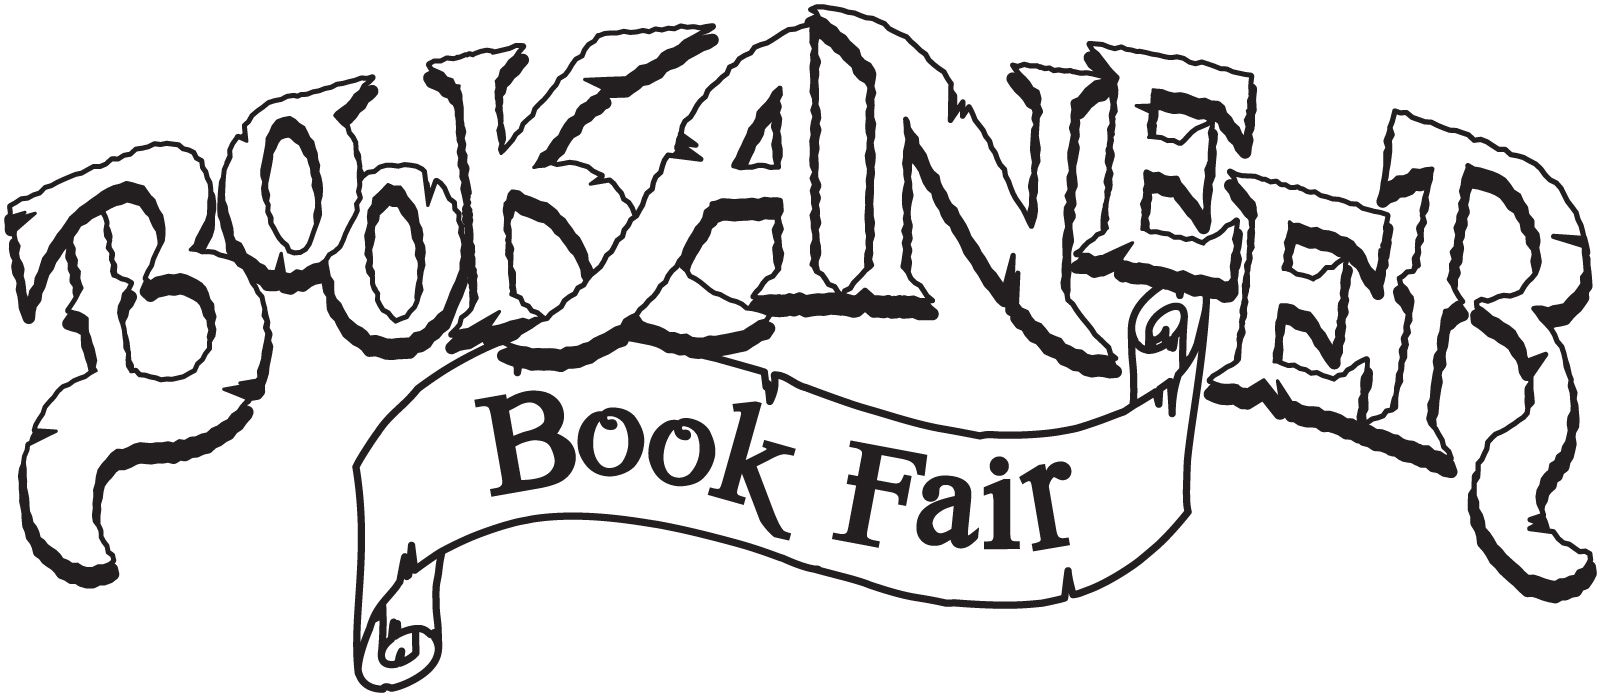 Clip Art Book Fair Clipart scholastic canada book fairs webart bookaneer fair clip art 1st of the school year